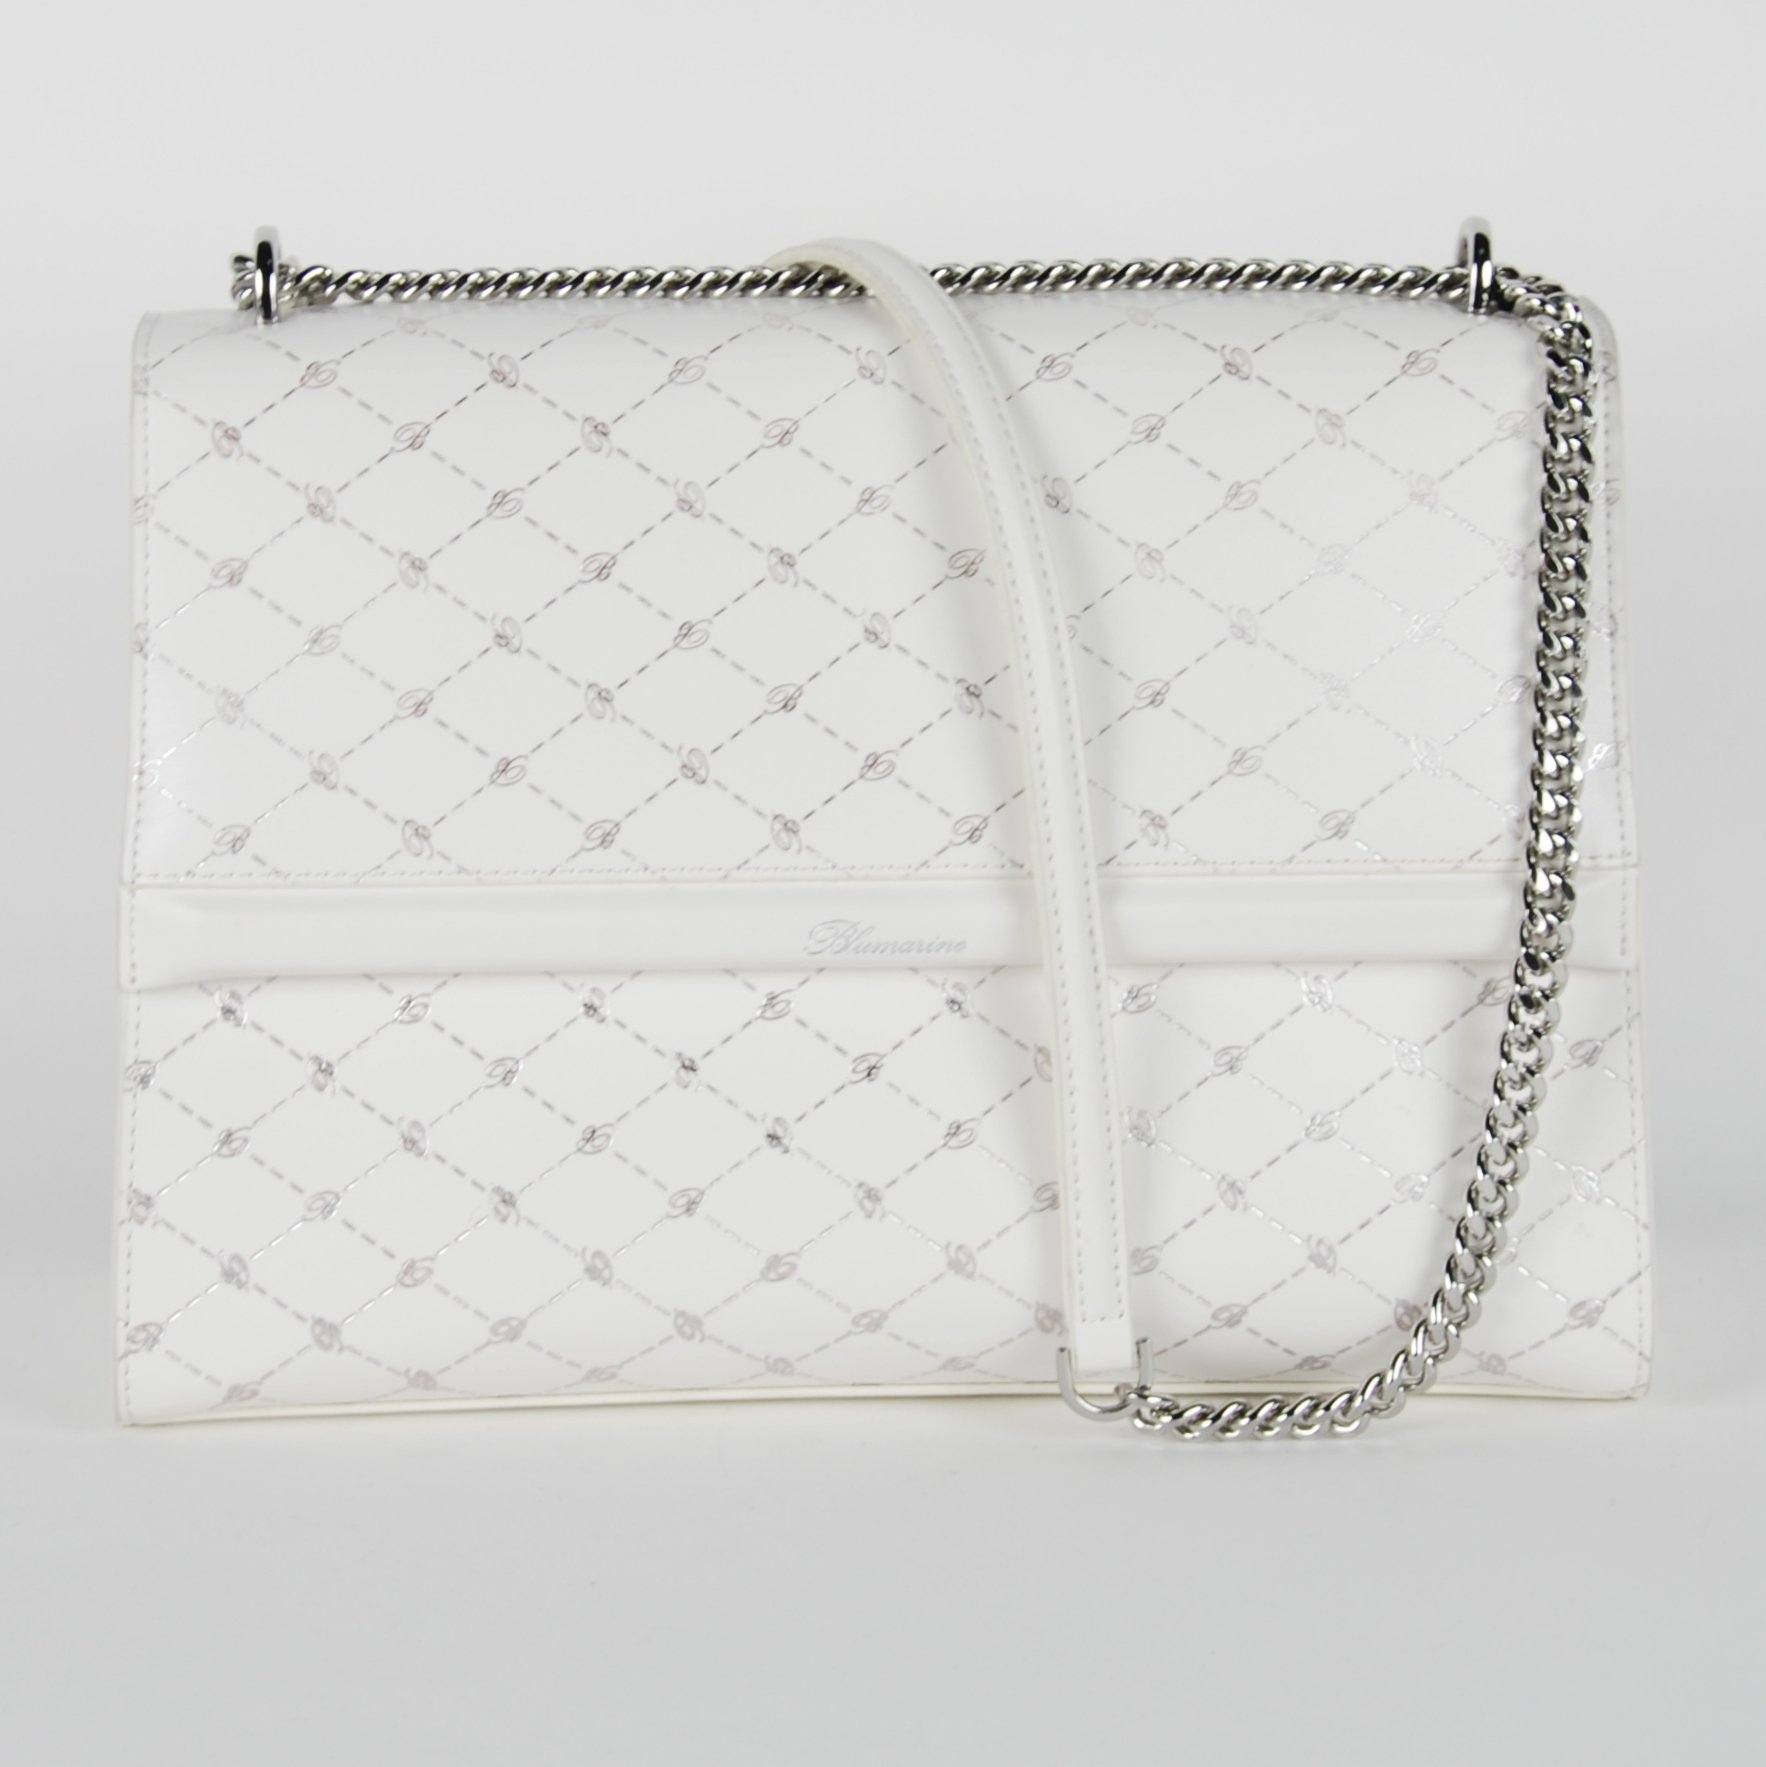 Blumarine Women's Shoulder Bag White BL1421544